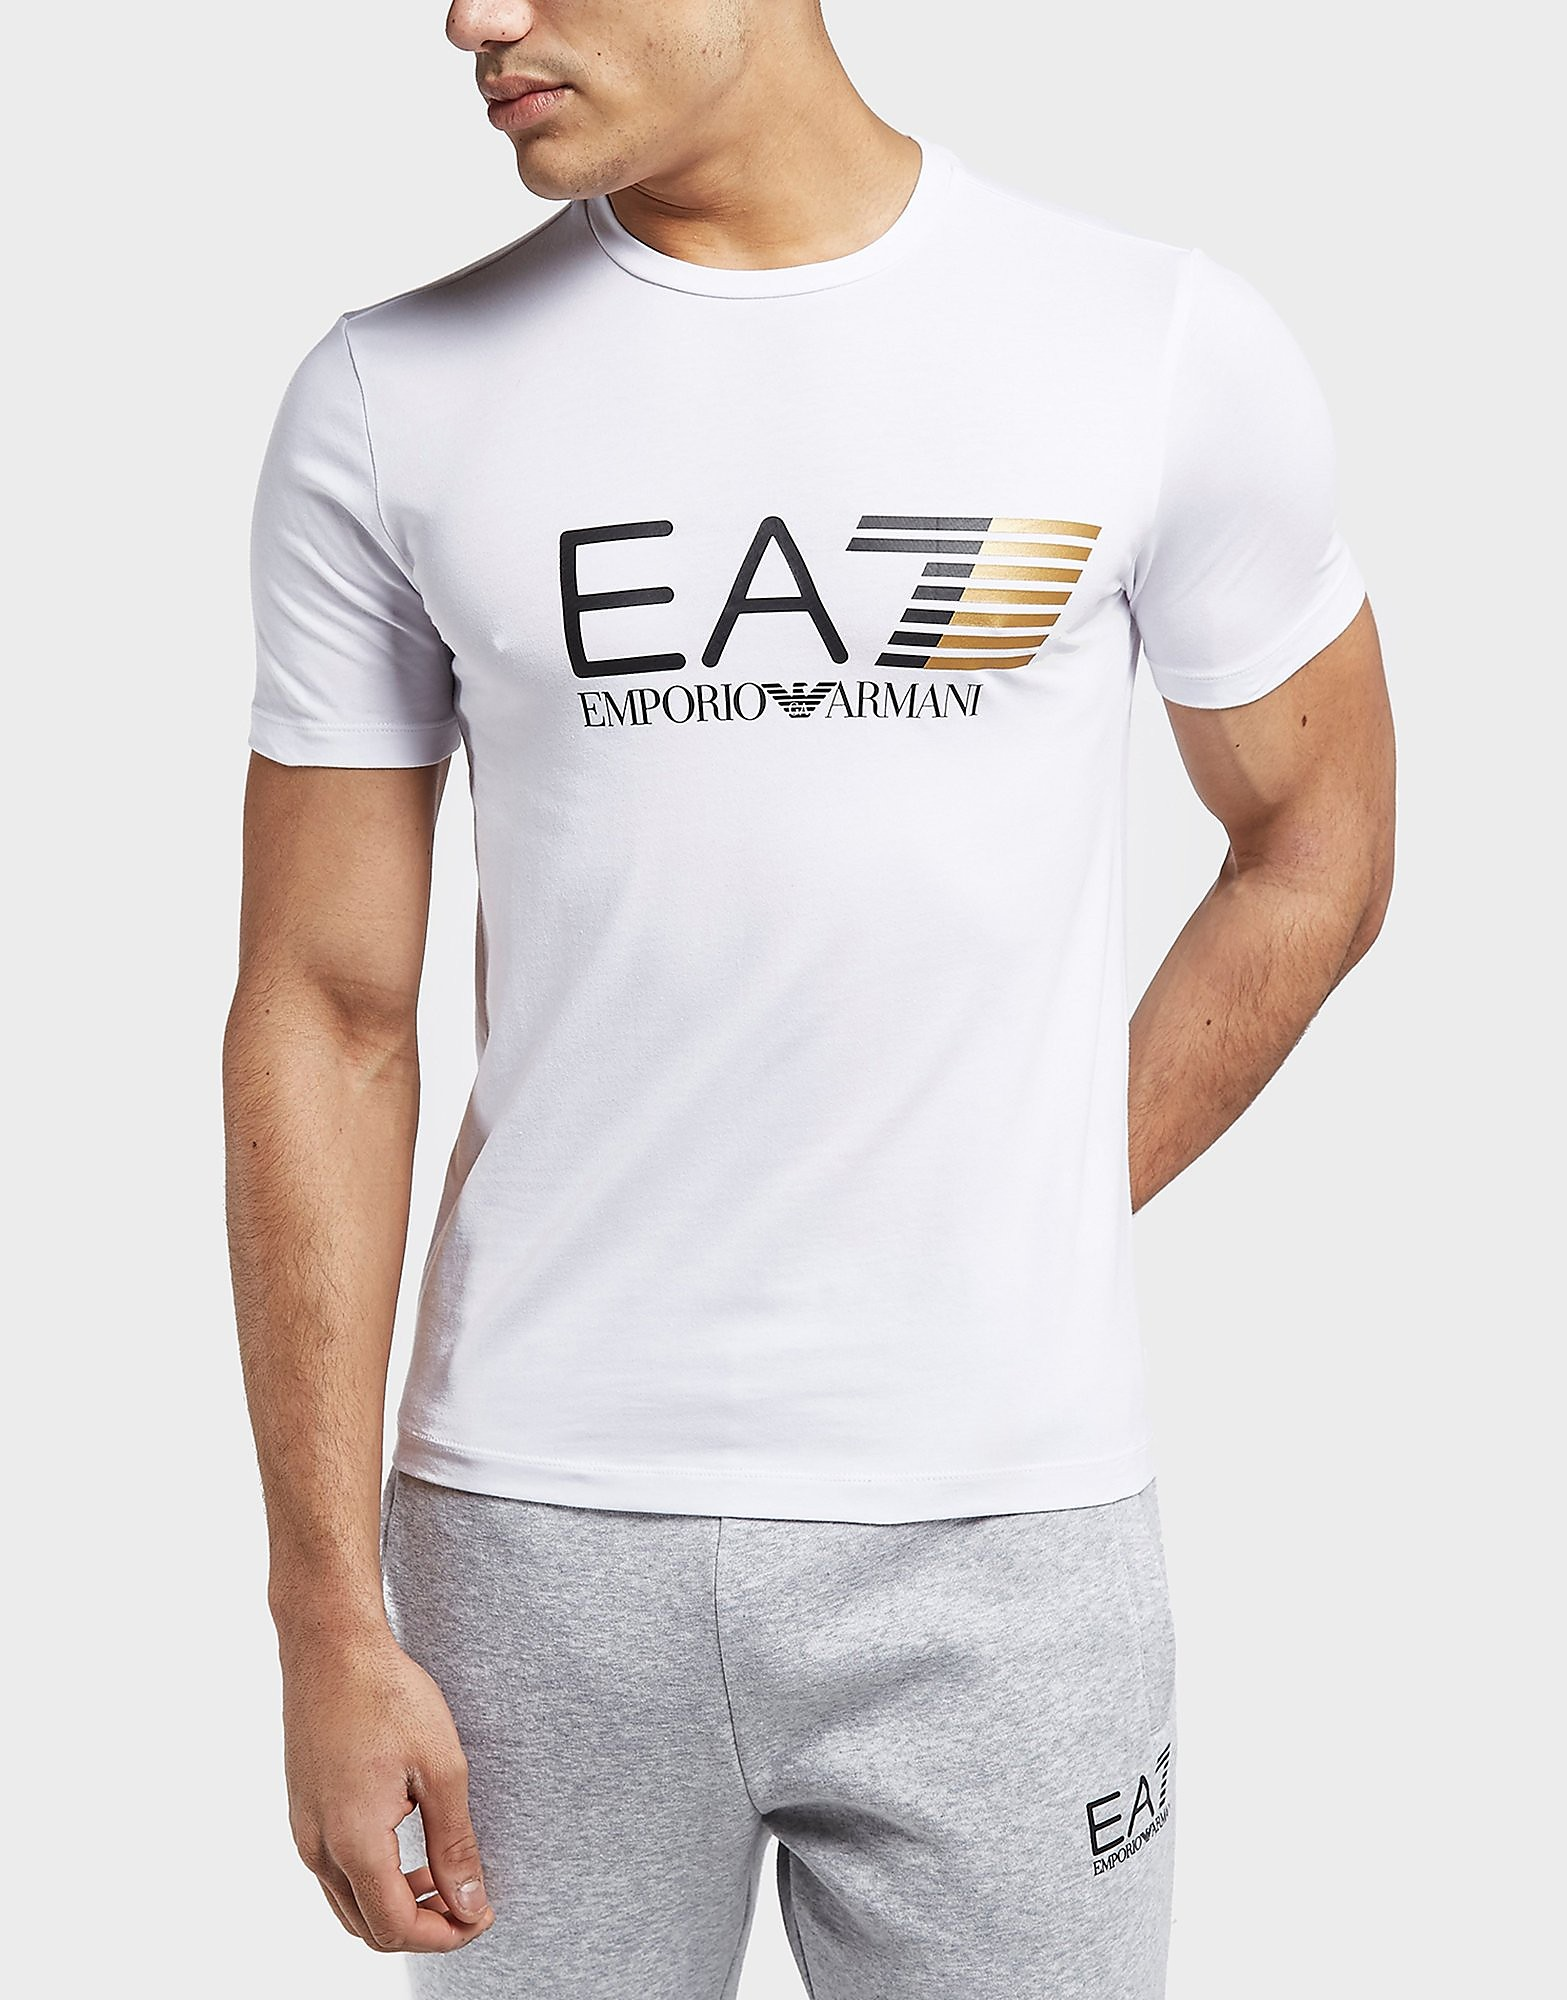 Emporio Armani EA7 Vis Stretch Short Sleeve T-Shirt